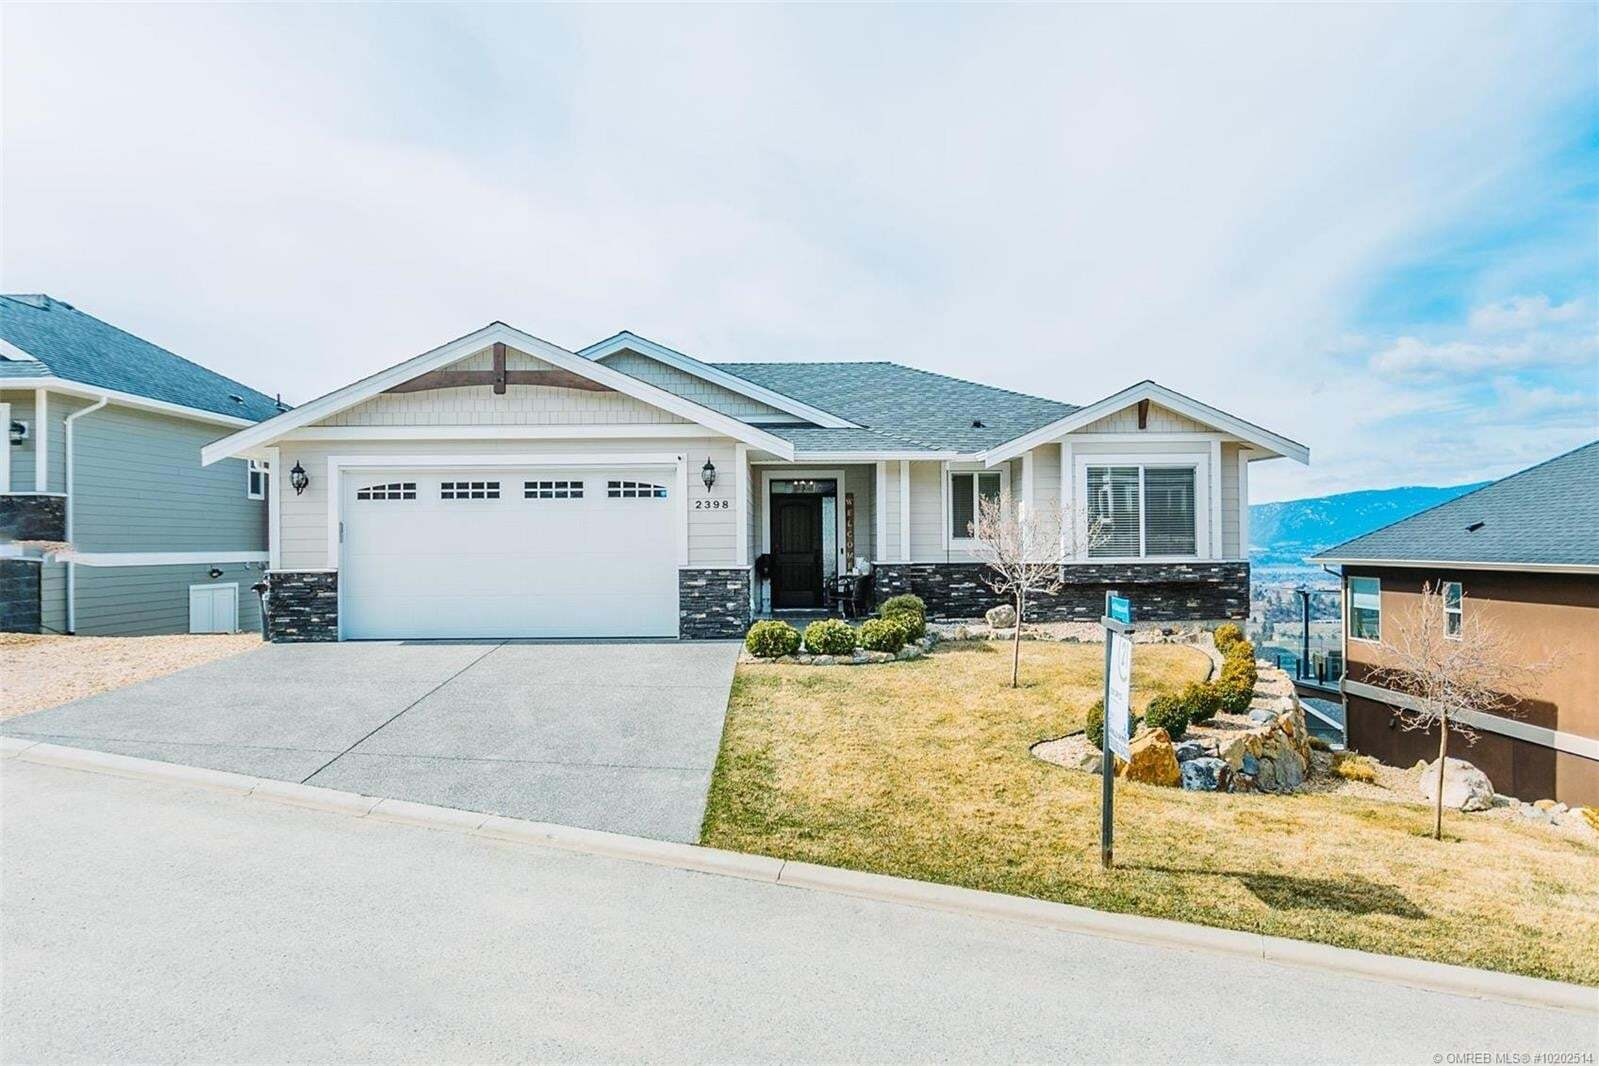 House for sale at 2398 Bellagio Ln Kelowna British Columbia - MLS: 10202514